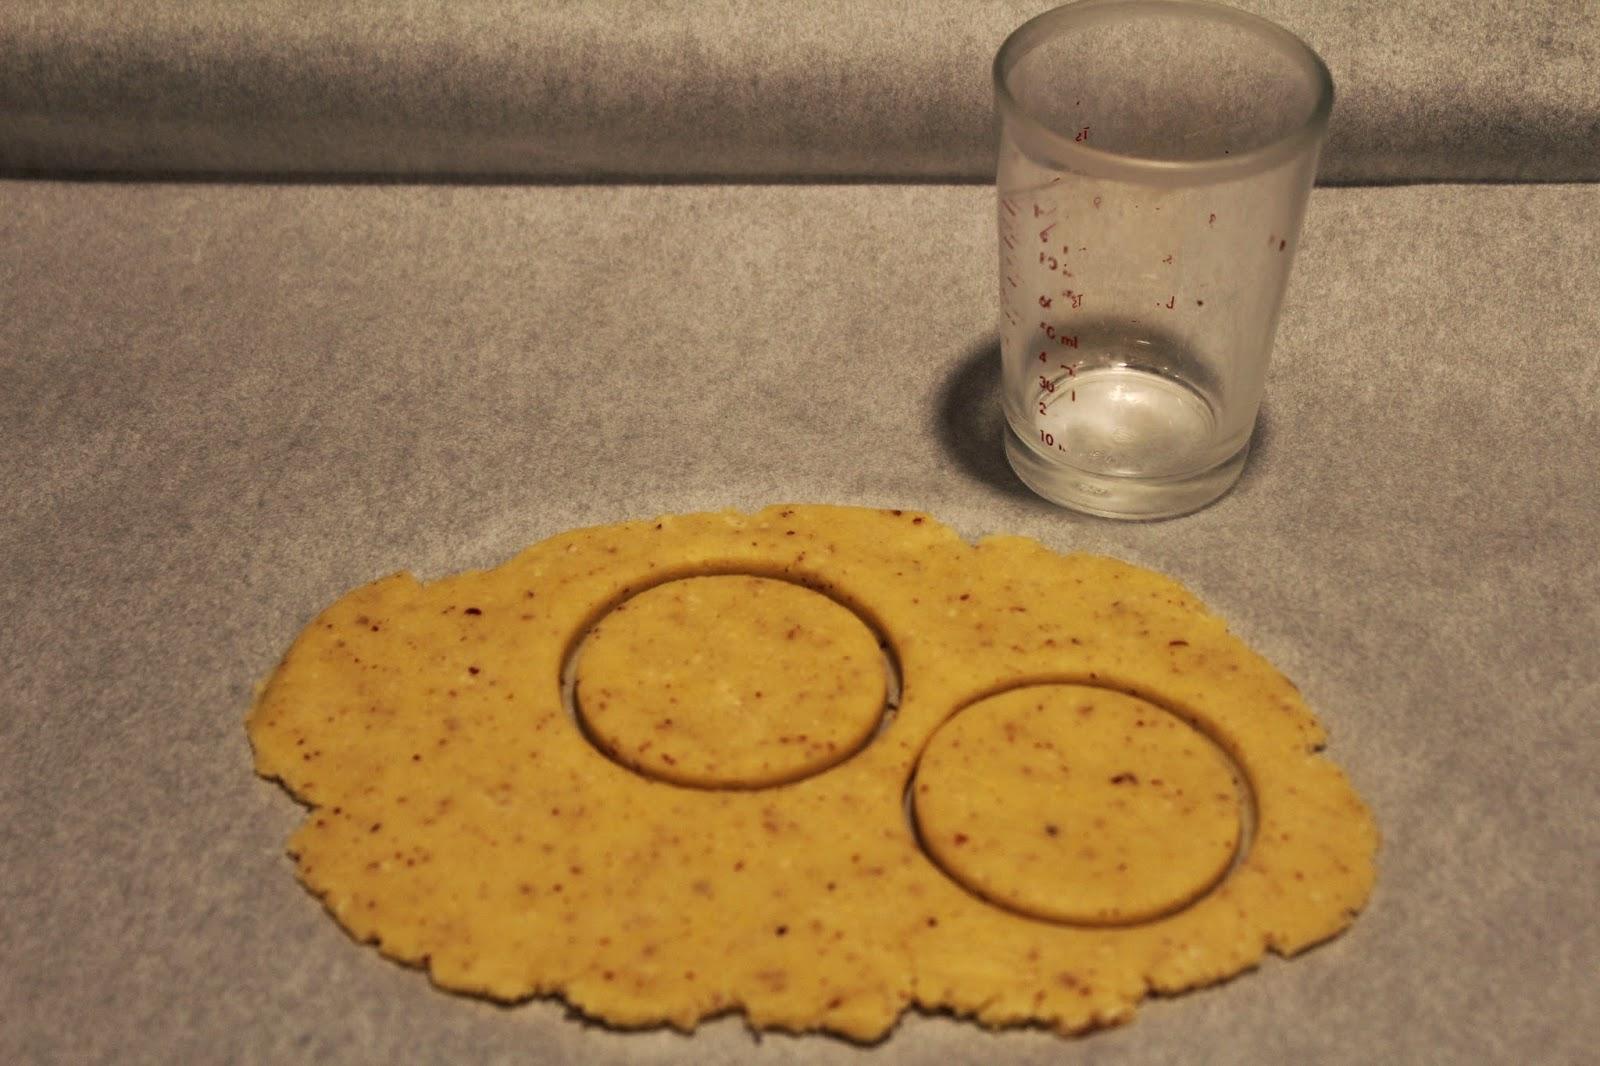 Yoplait Greek 100 Whips Cookie Cups